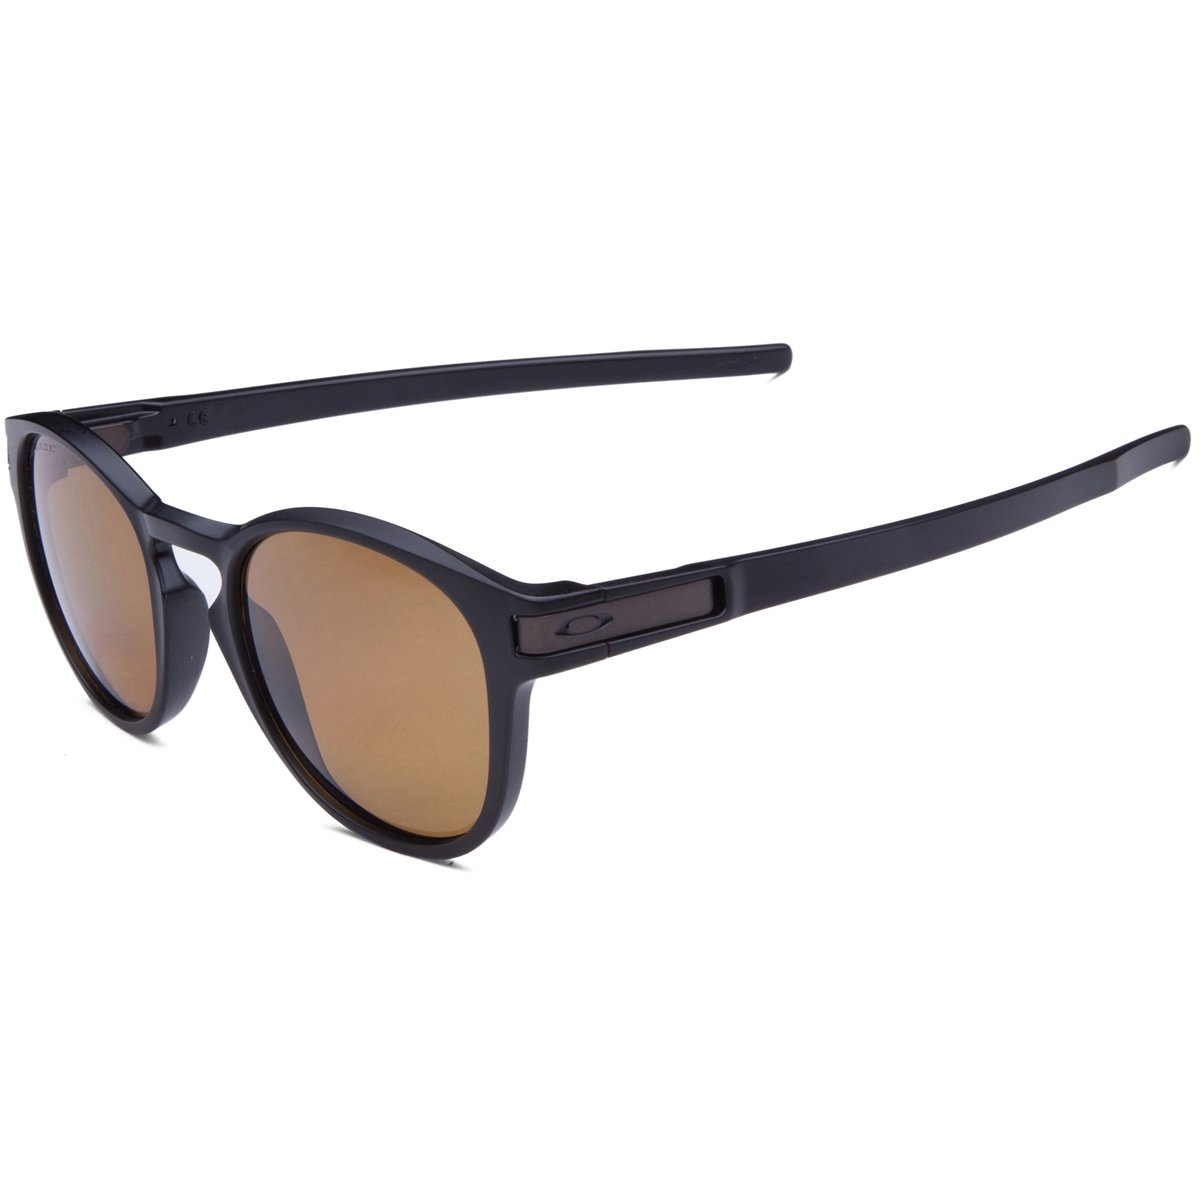 Óculos Casuais Oakley   Netshoes 8d778b4ff5